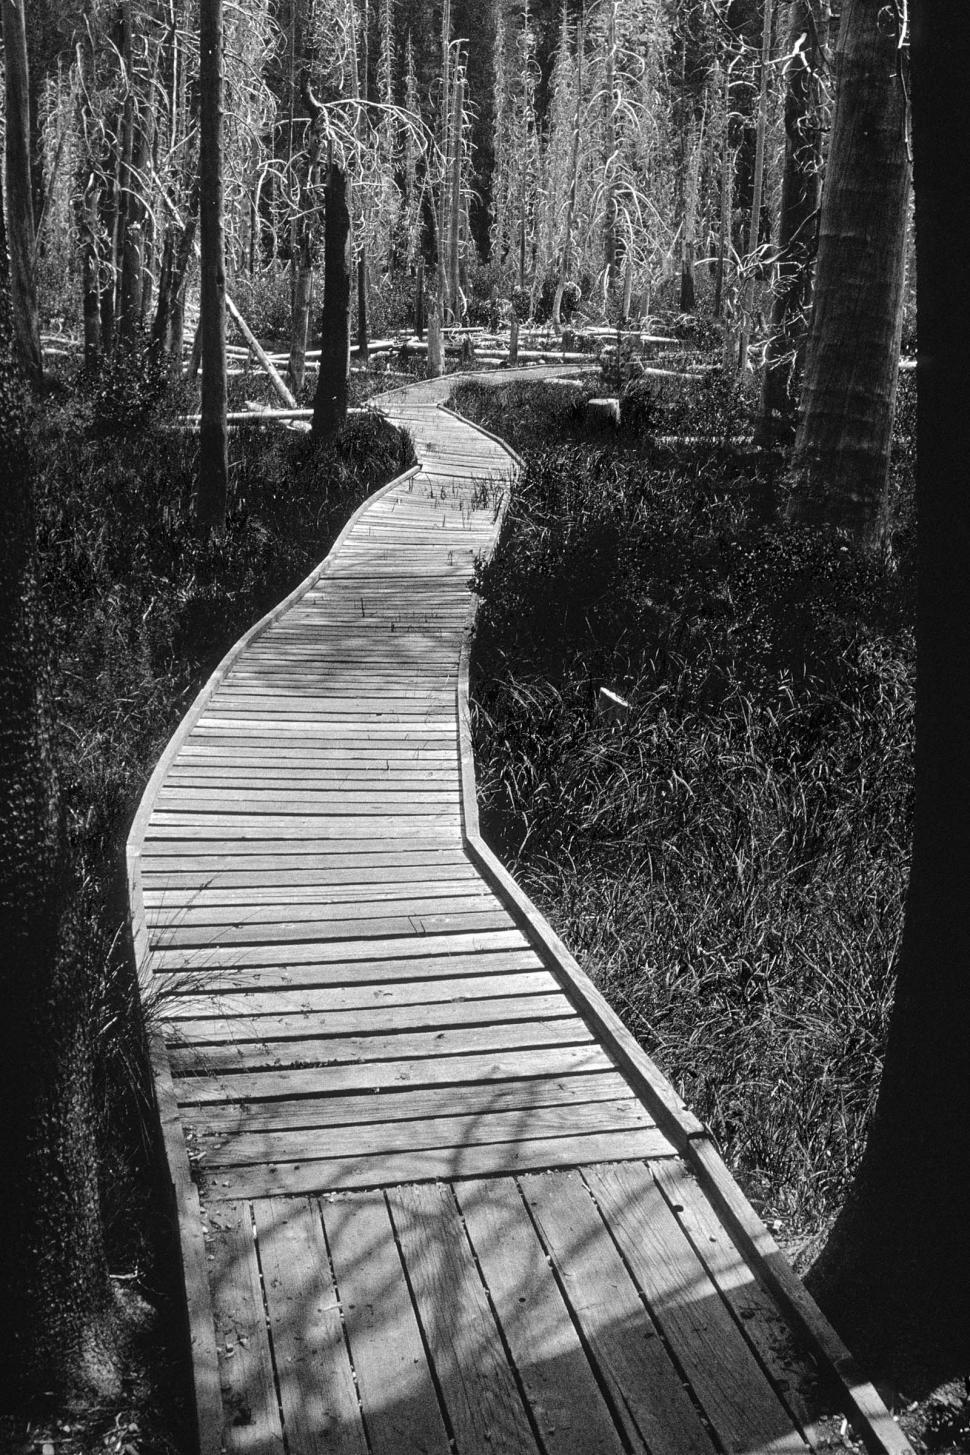 Download Free Stock Photo of Boardwalk through marsh, black and white